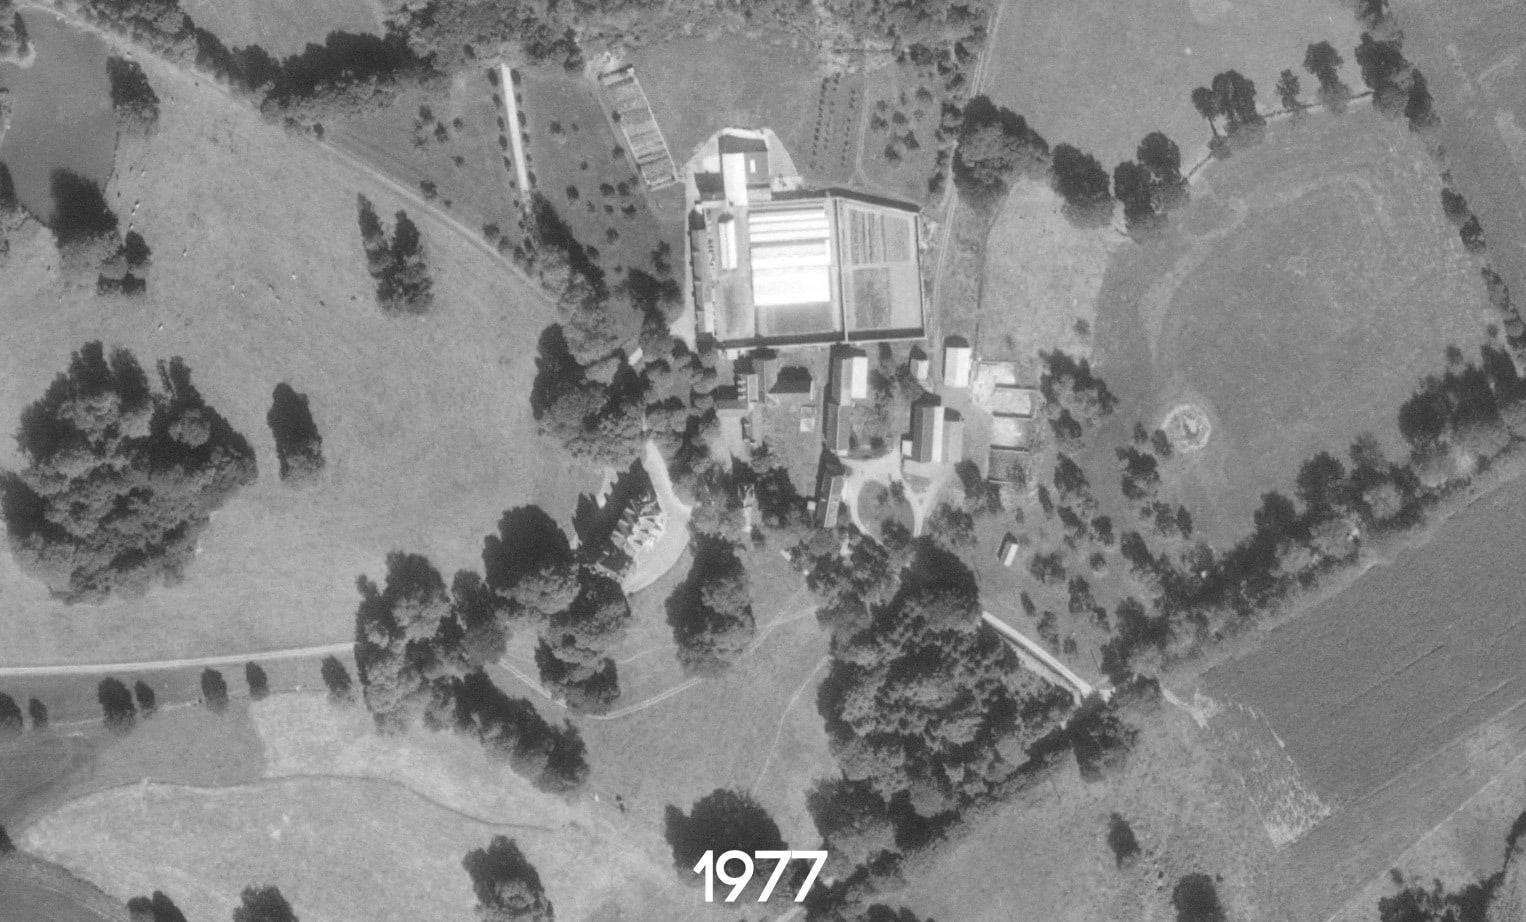 chateau-marko-bey-before-map-1977